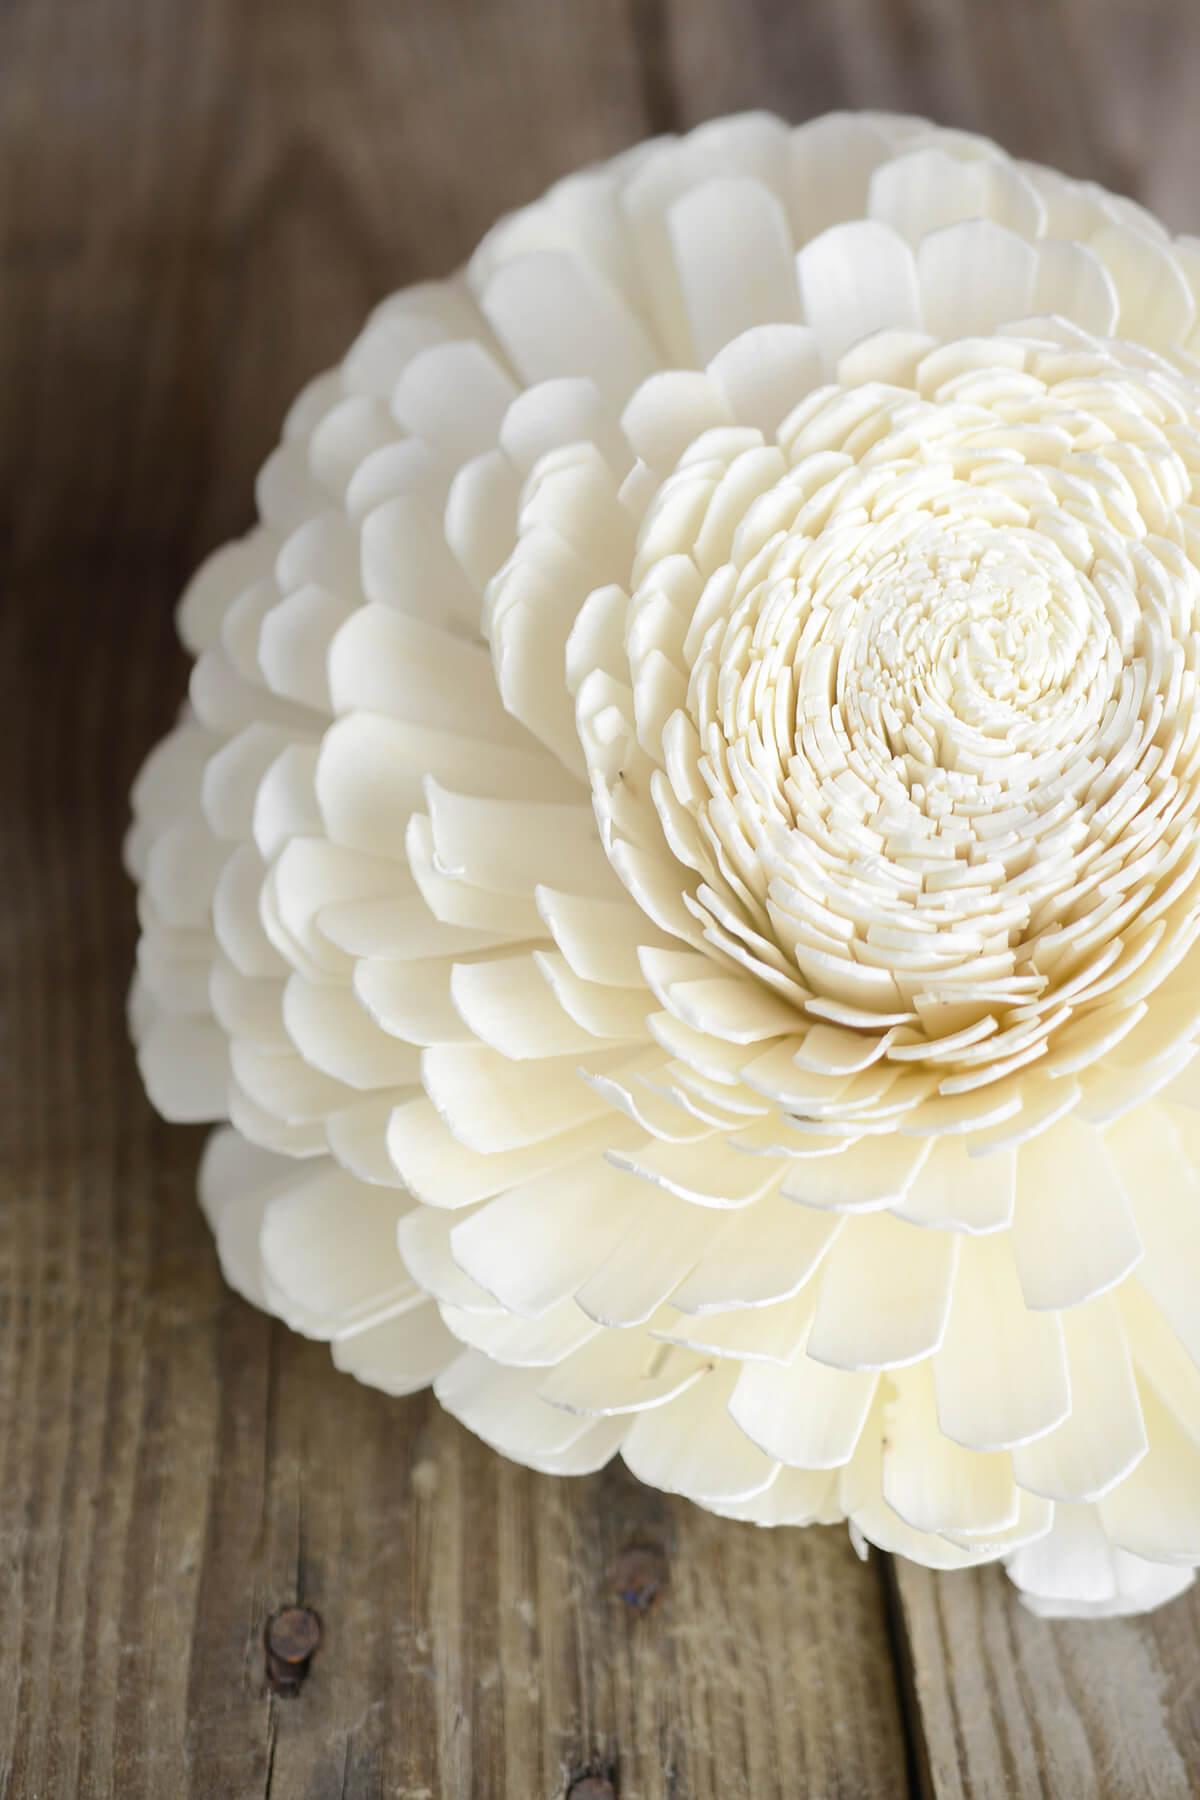 Sola flowersbeautiful handmadesaveoncrafts 2 large 8in sola belly flower 20cm sola flowers izmirmasajfo